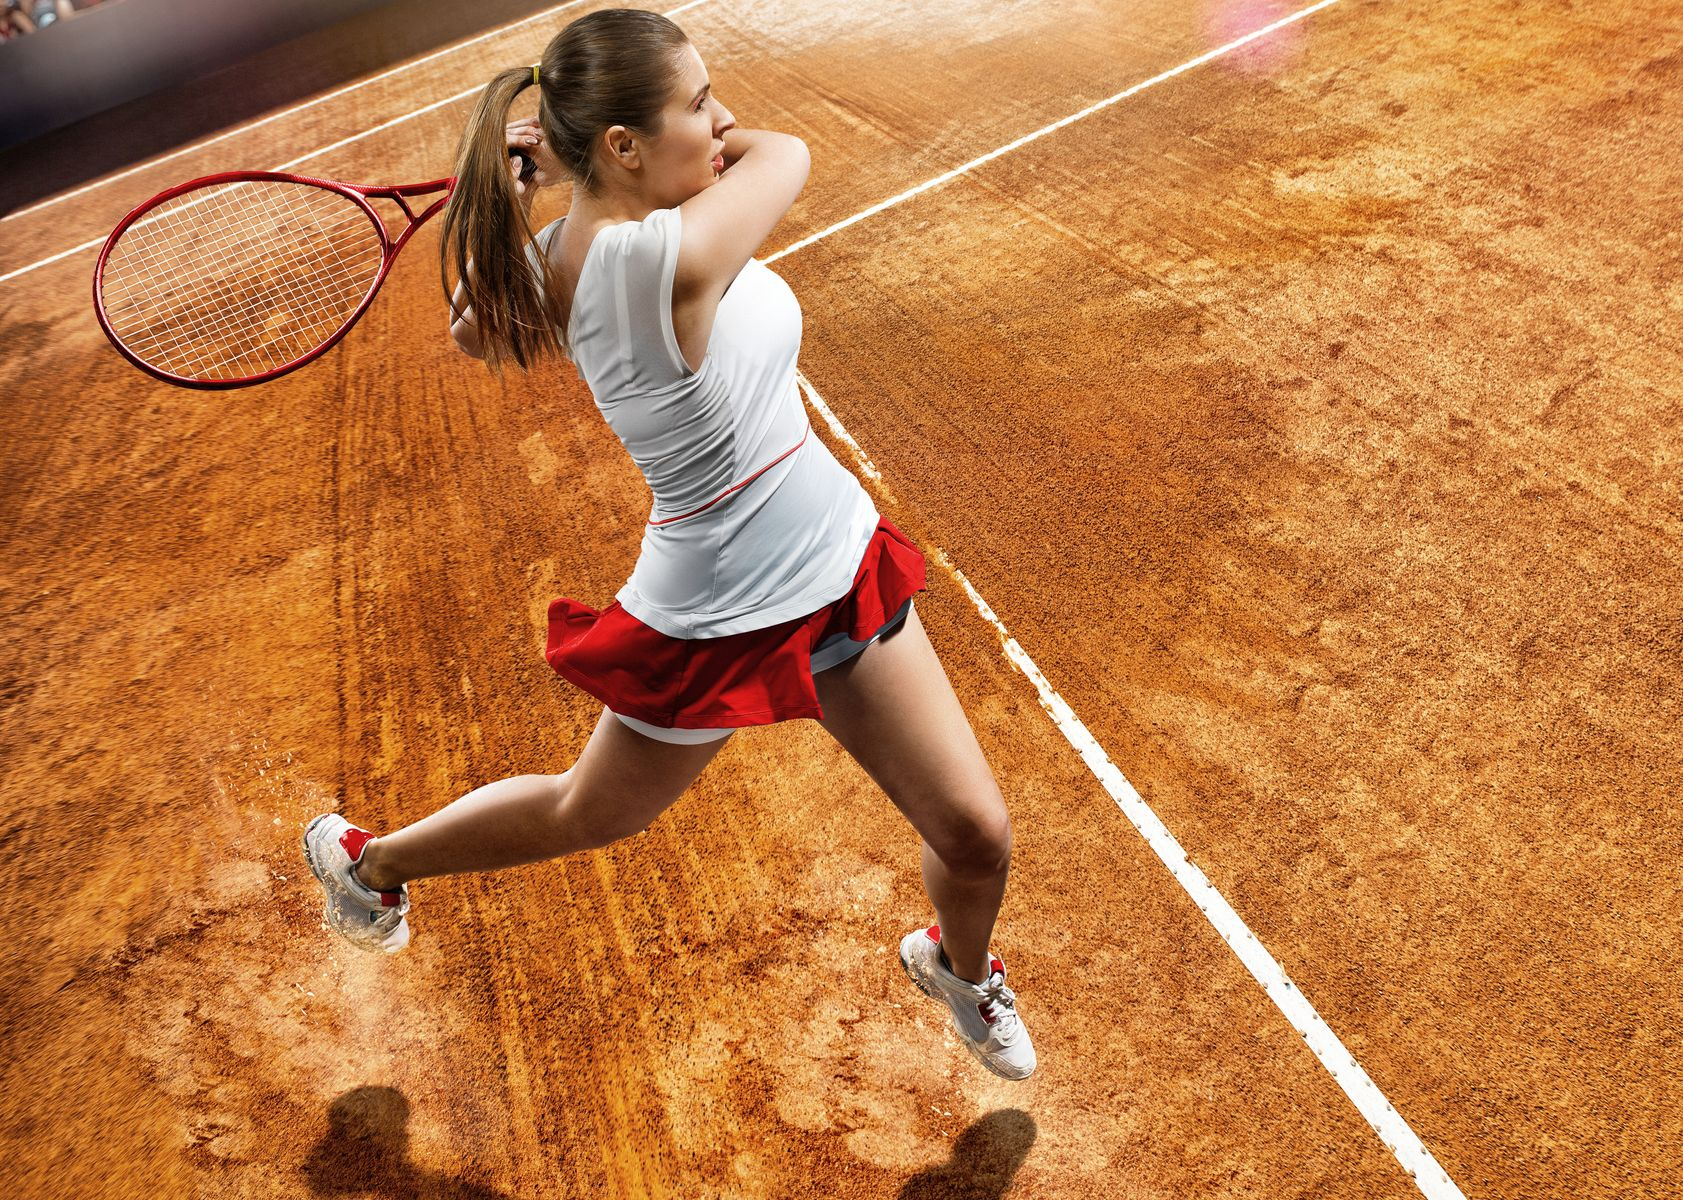 sport-dimagrire-tennis-1070712_origin